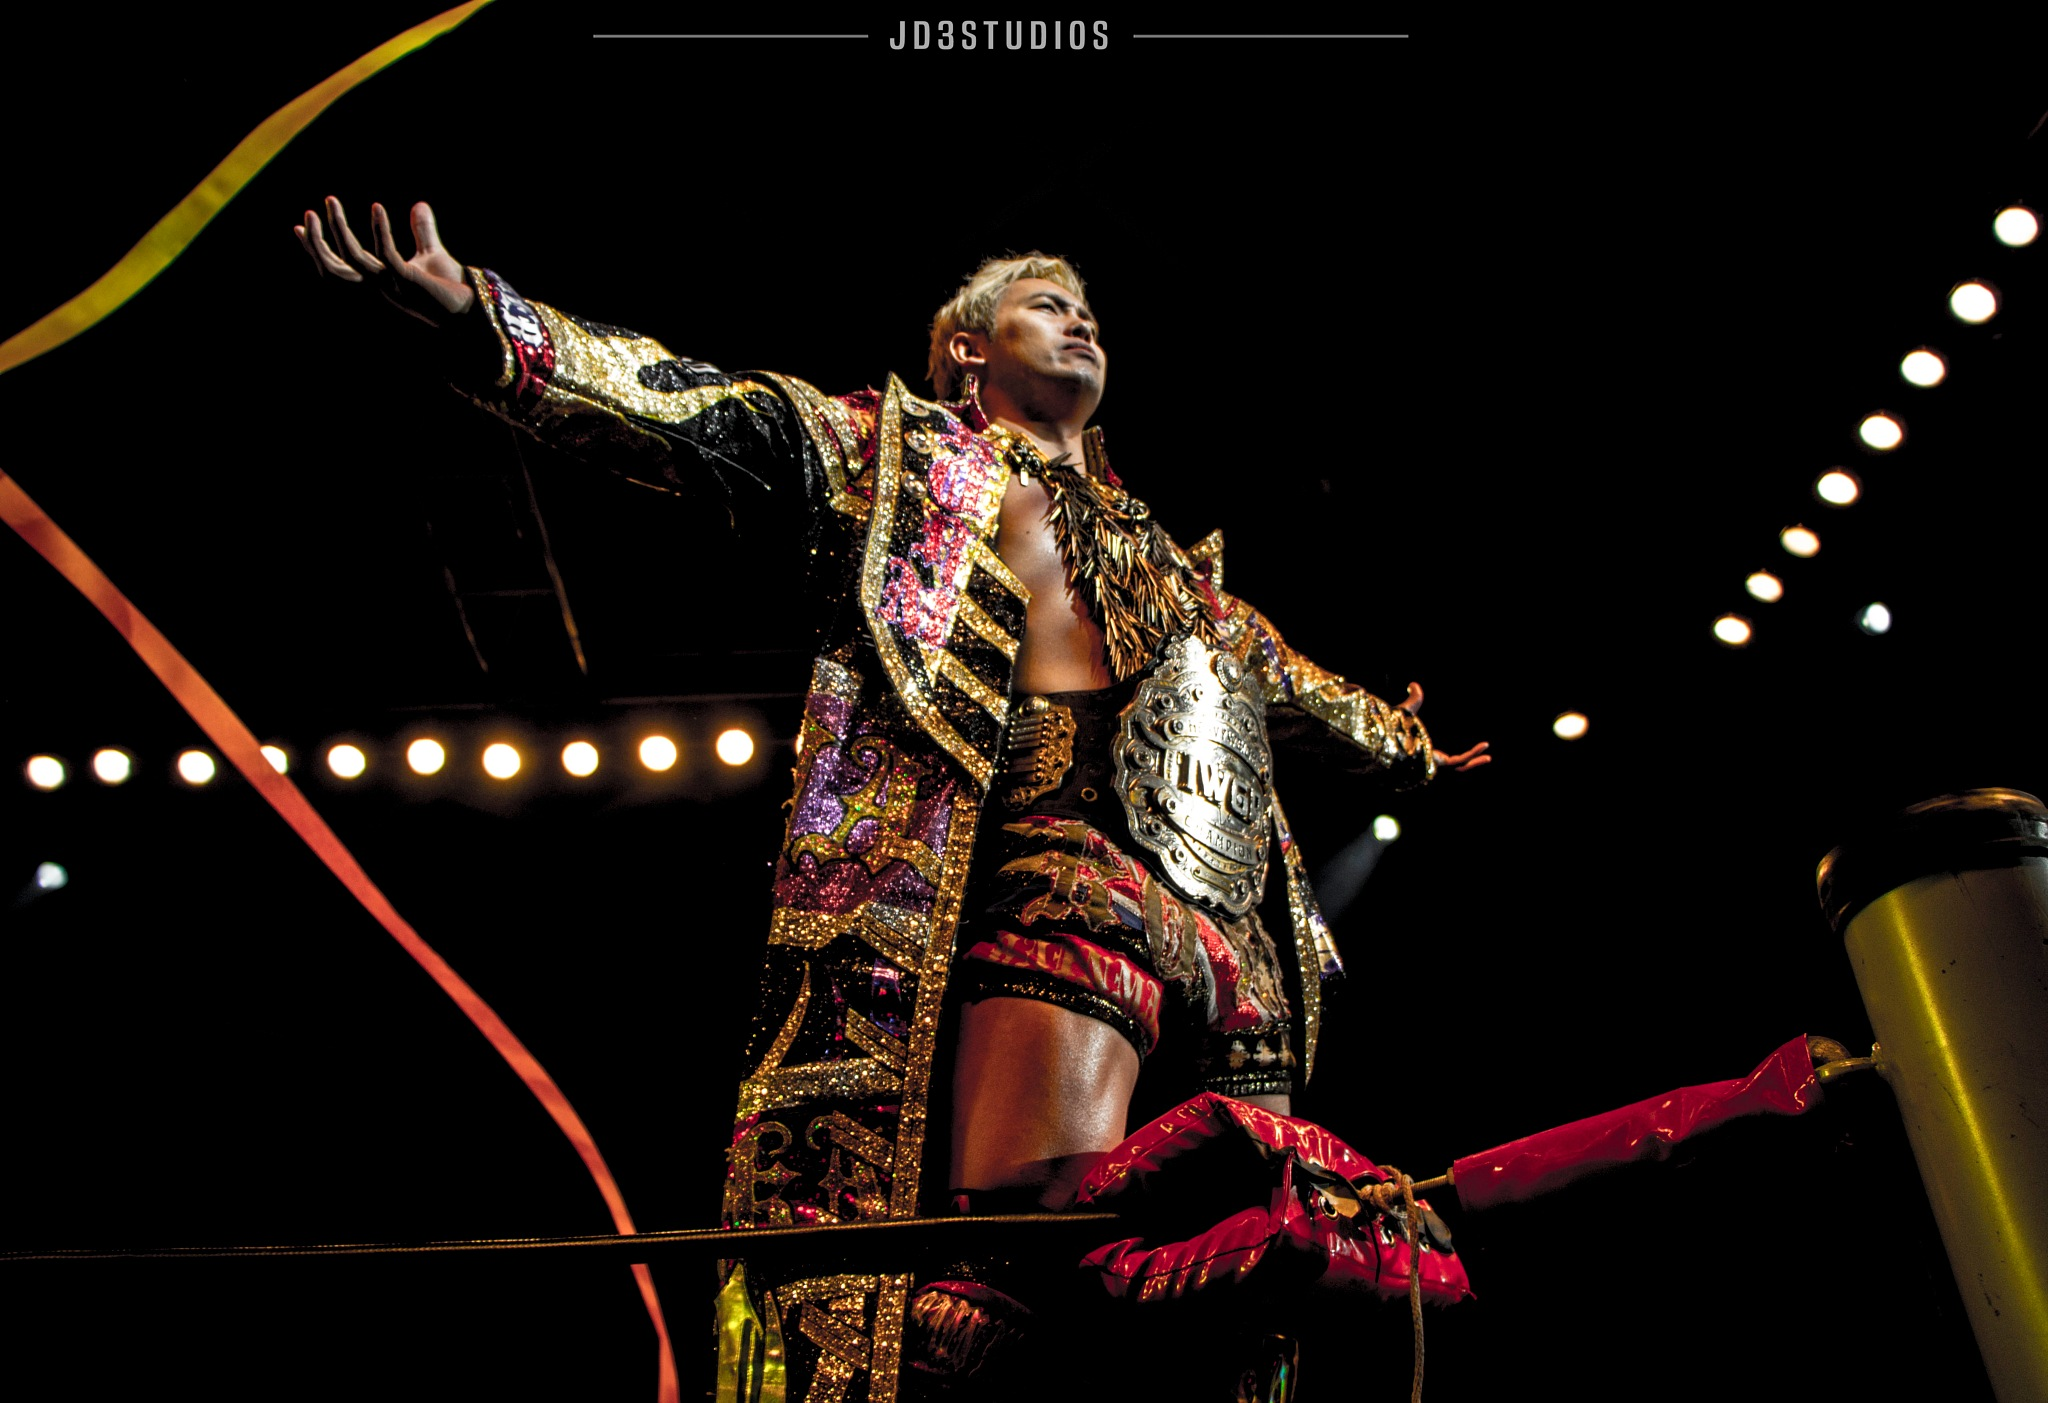 Former IWGP Heavyweight Champion - Kazuchika Okada by JD3Studios l Joseph DeFalco III